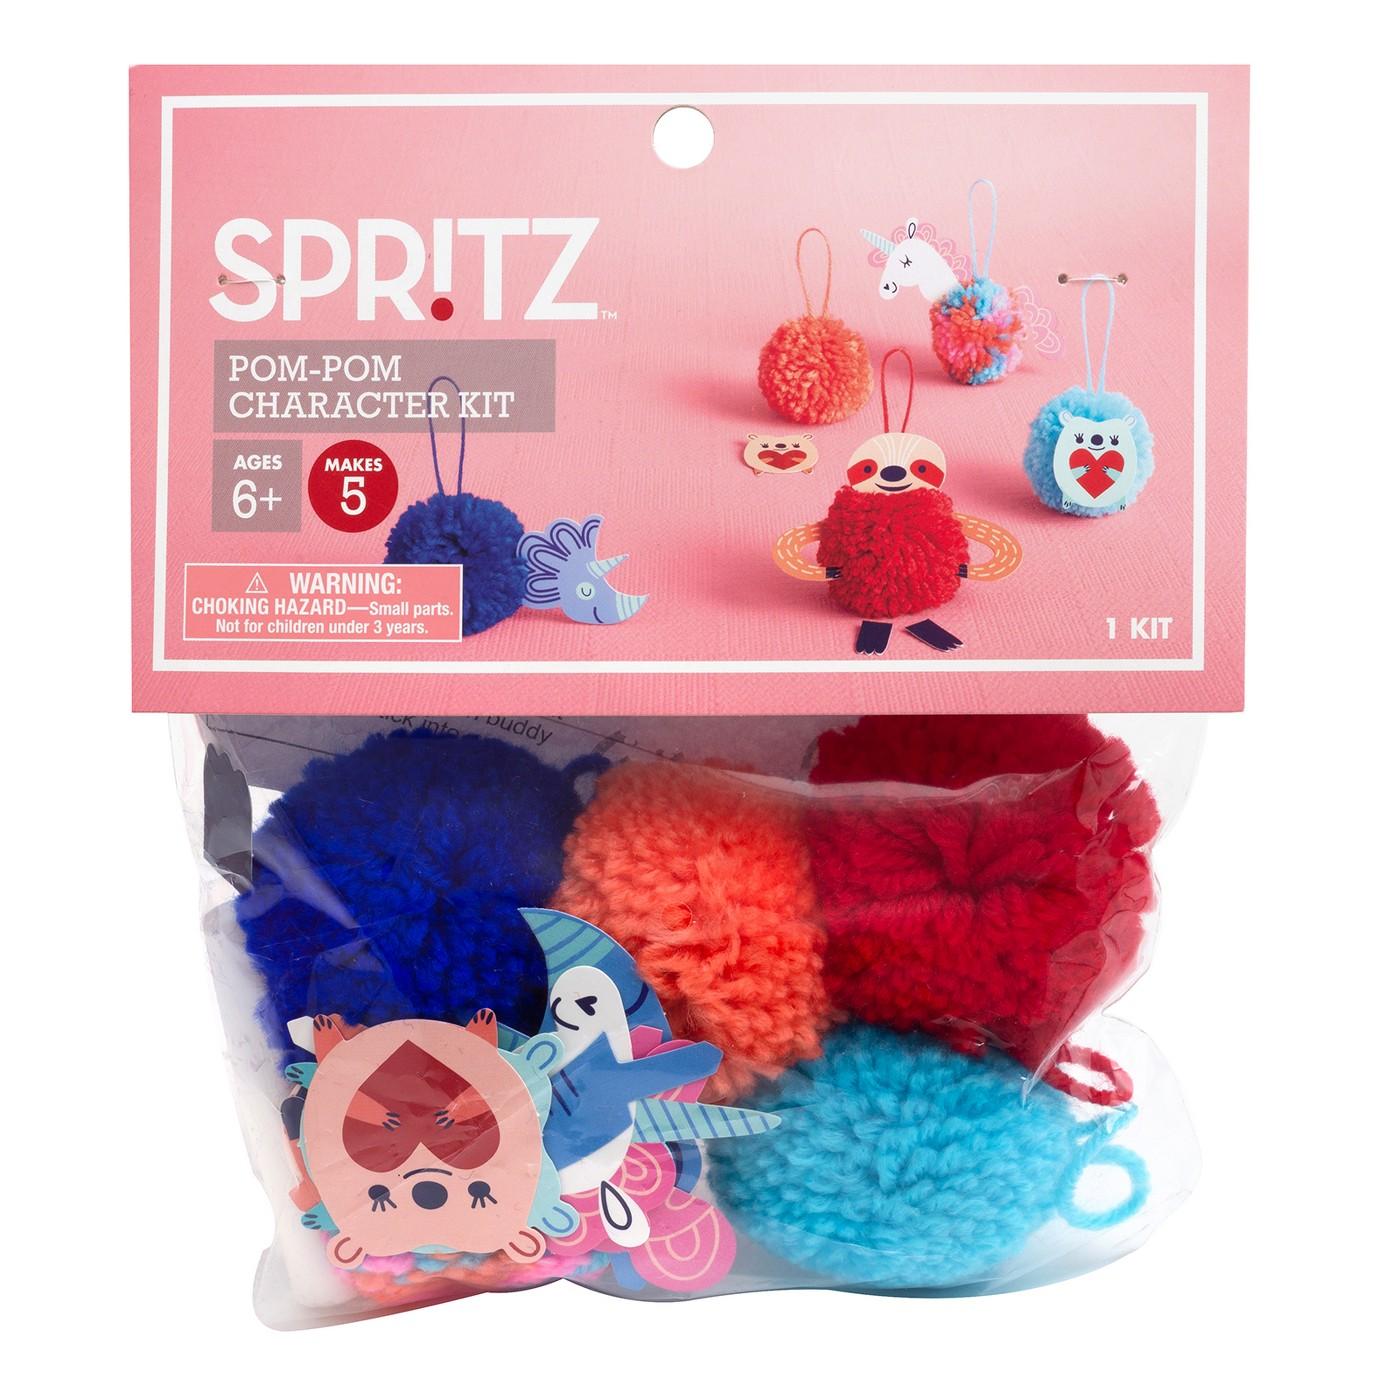 18pc Pom-Pom Character Kit - Spritz™ - image 1 of 3